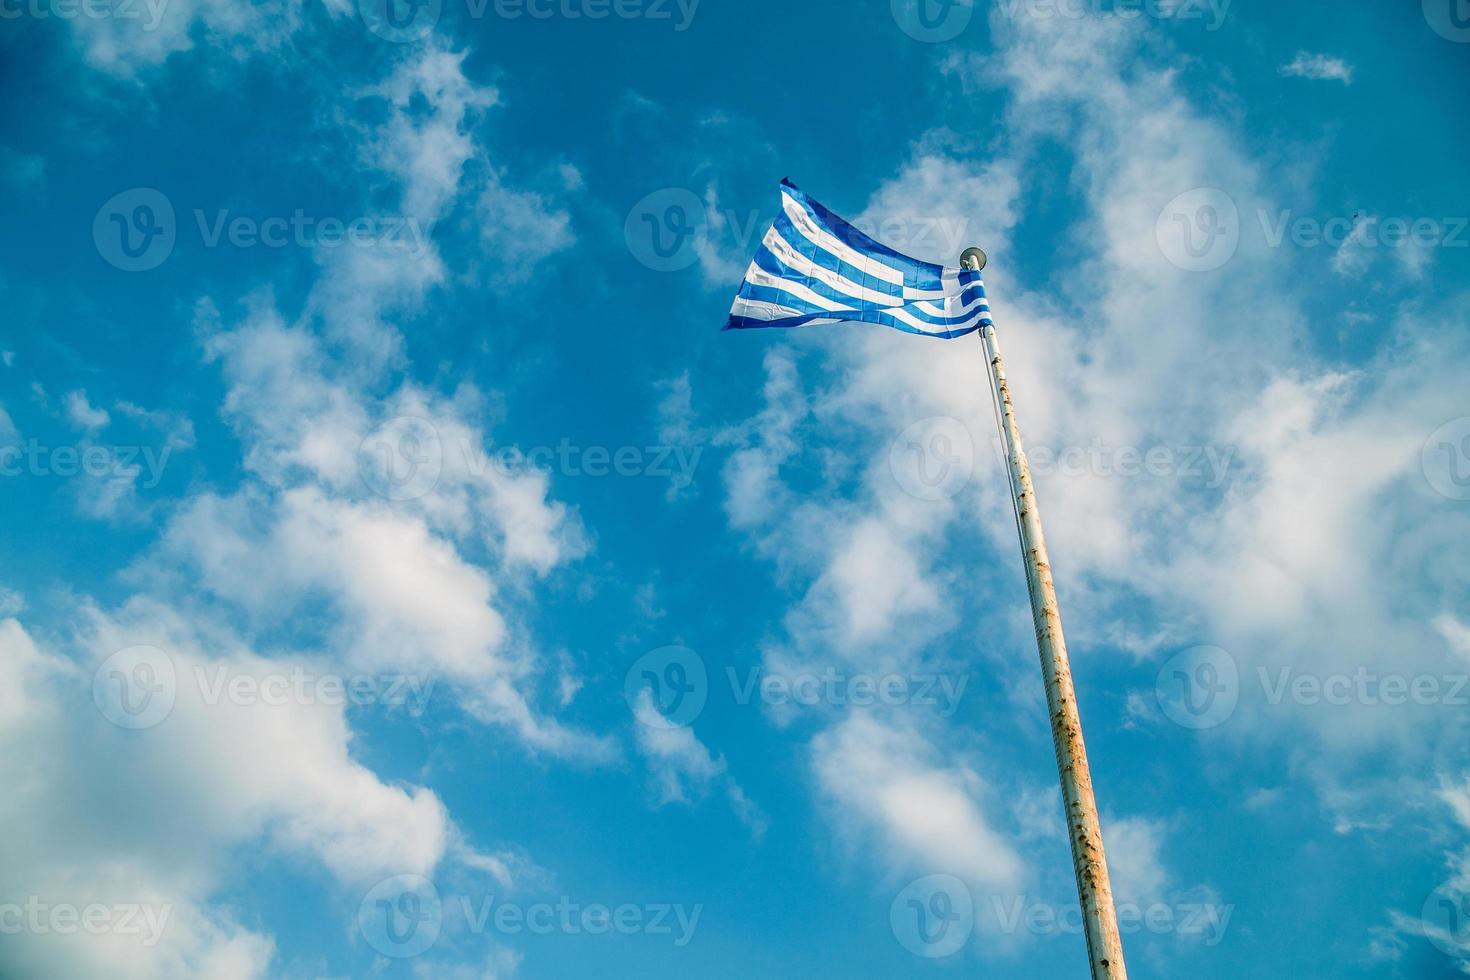 griekenland vlag op de vlaggenmast foto